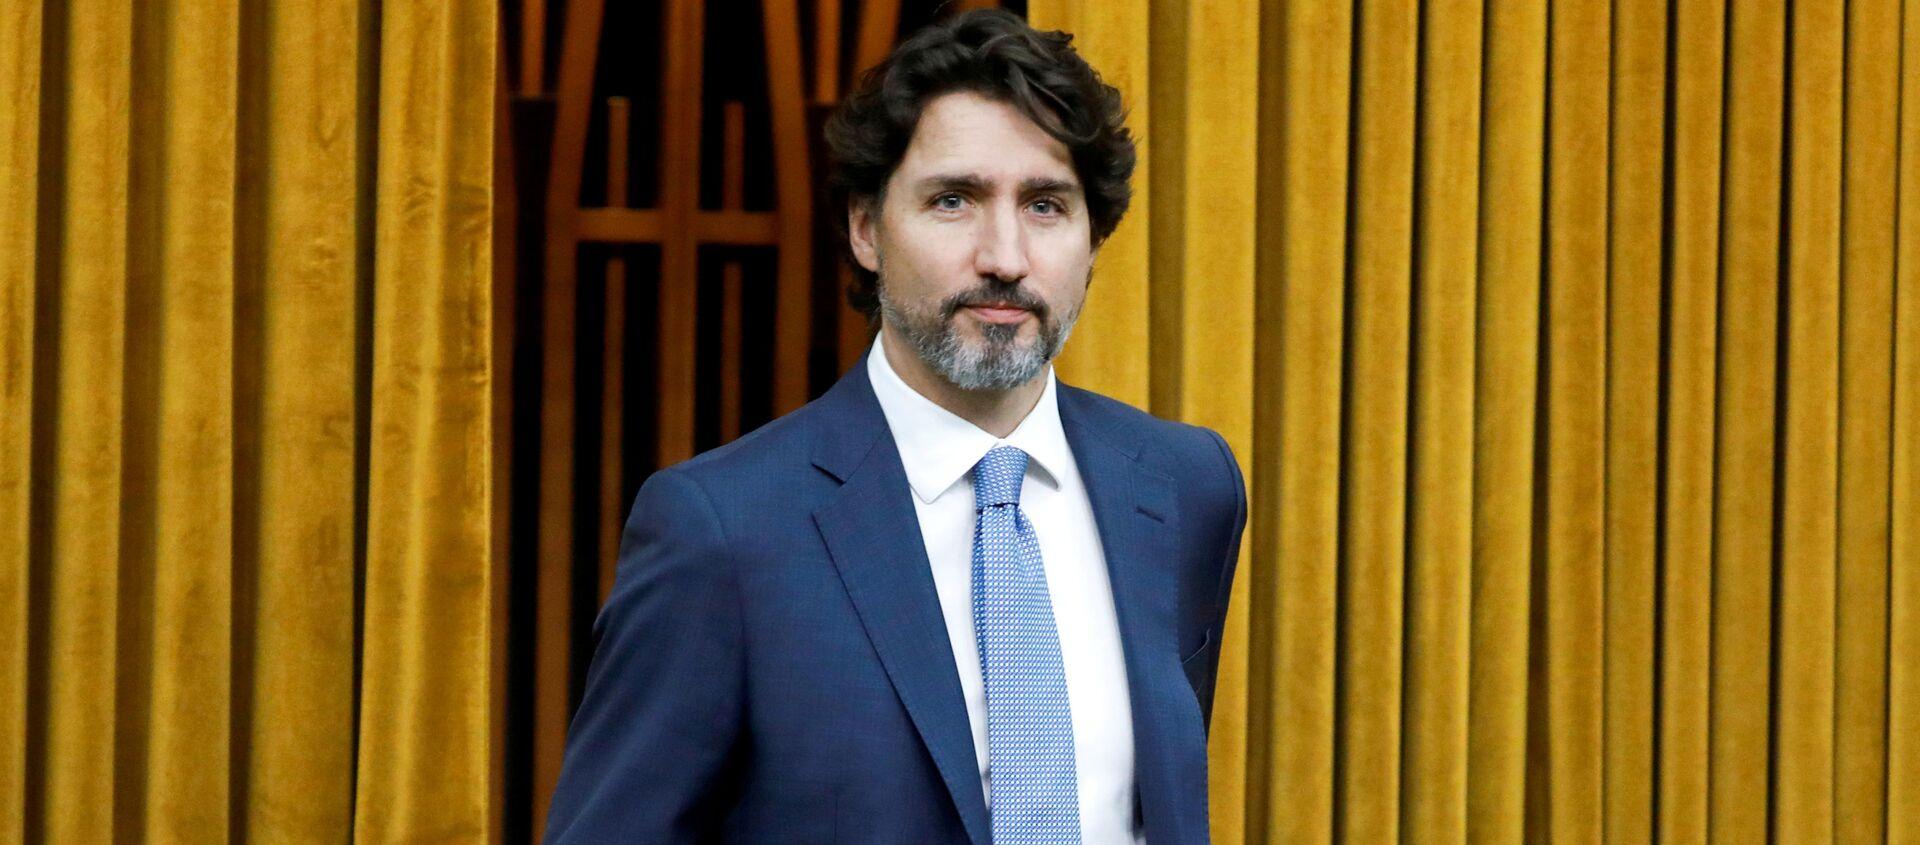 Justin Trudeau, primer ministro de Canadá - Sputnik Mundo, 1920, 19.06.2020